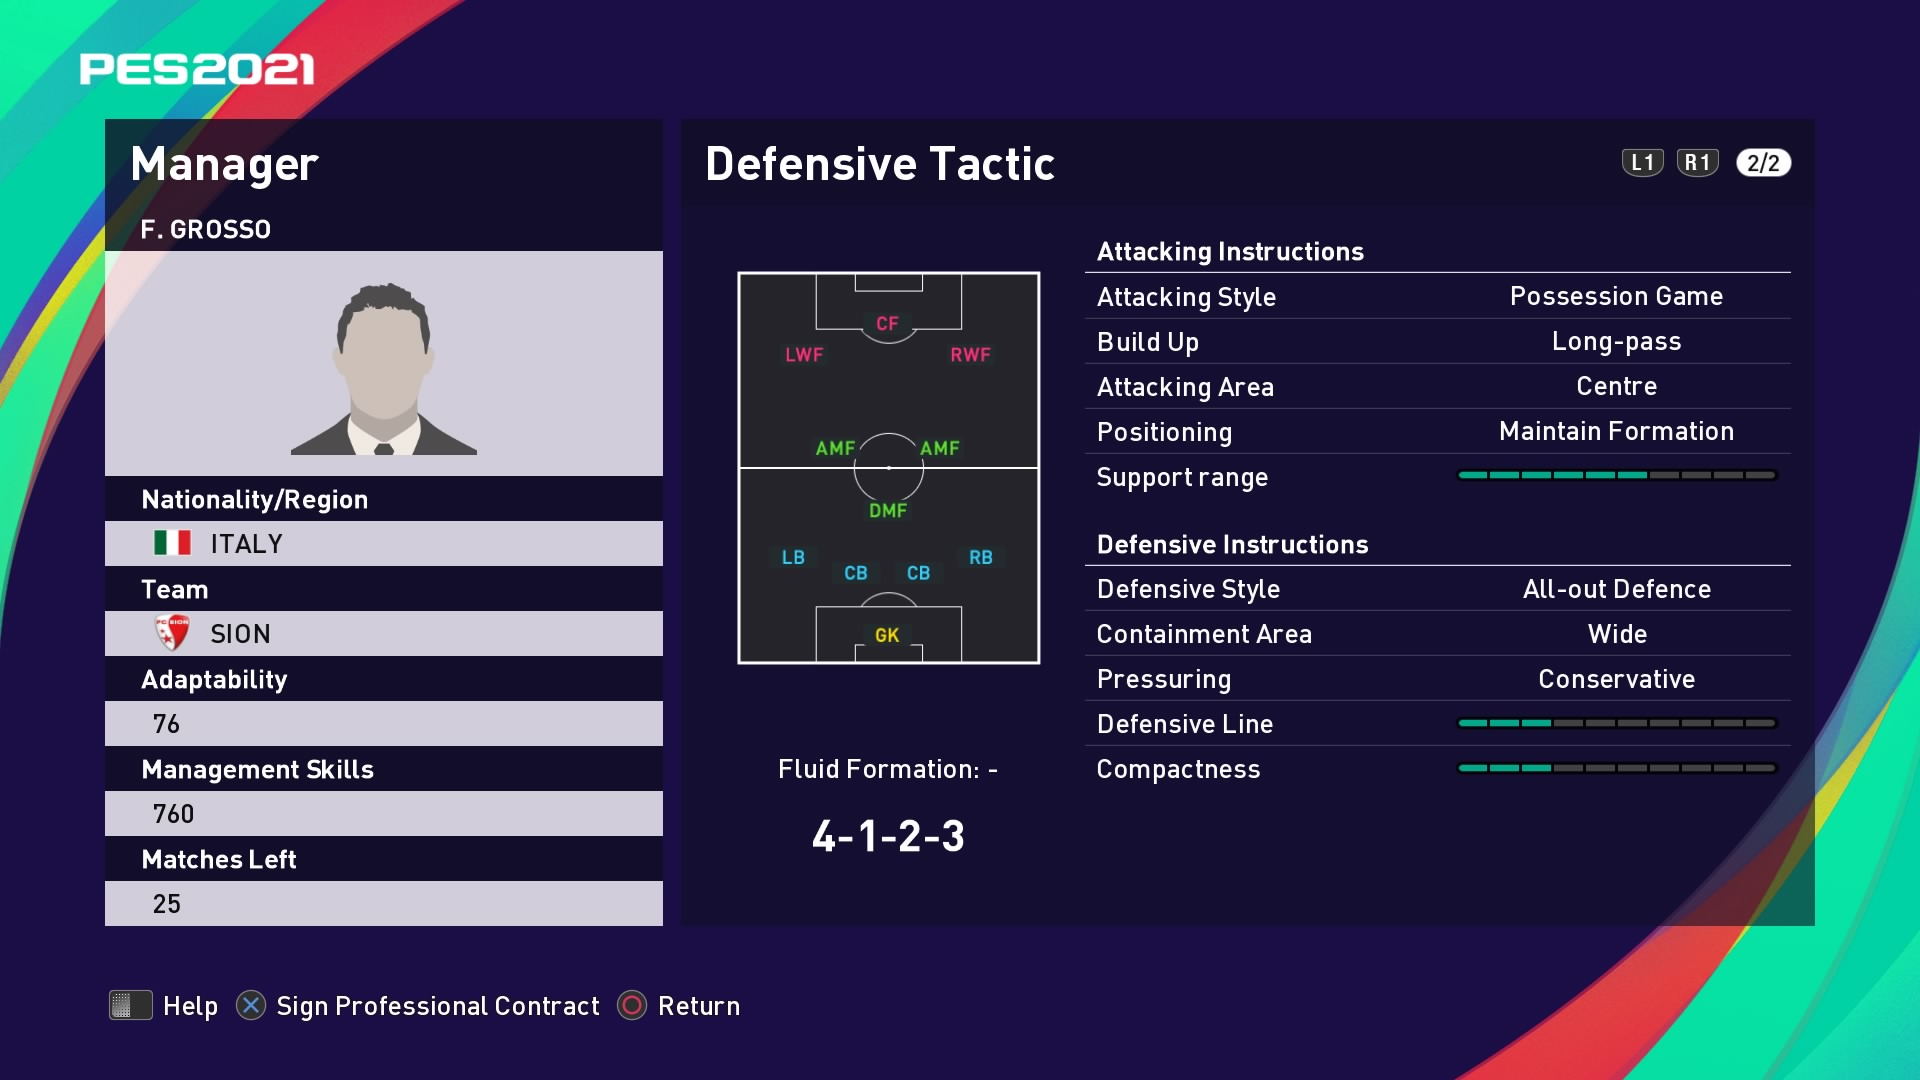 F. Grosso (Fabio Grosso) Defensive Tactic in PES 2021 myClub